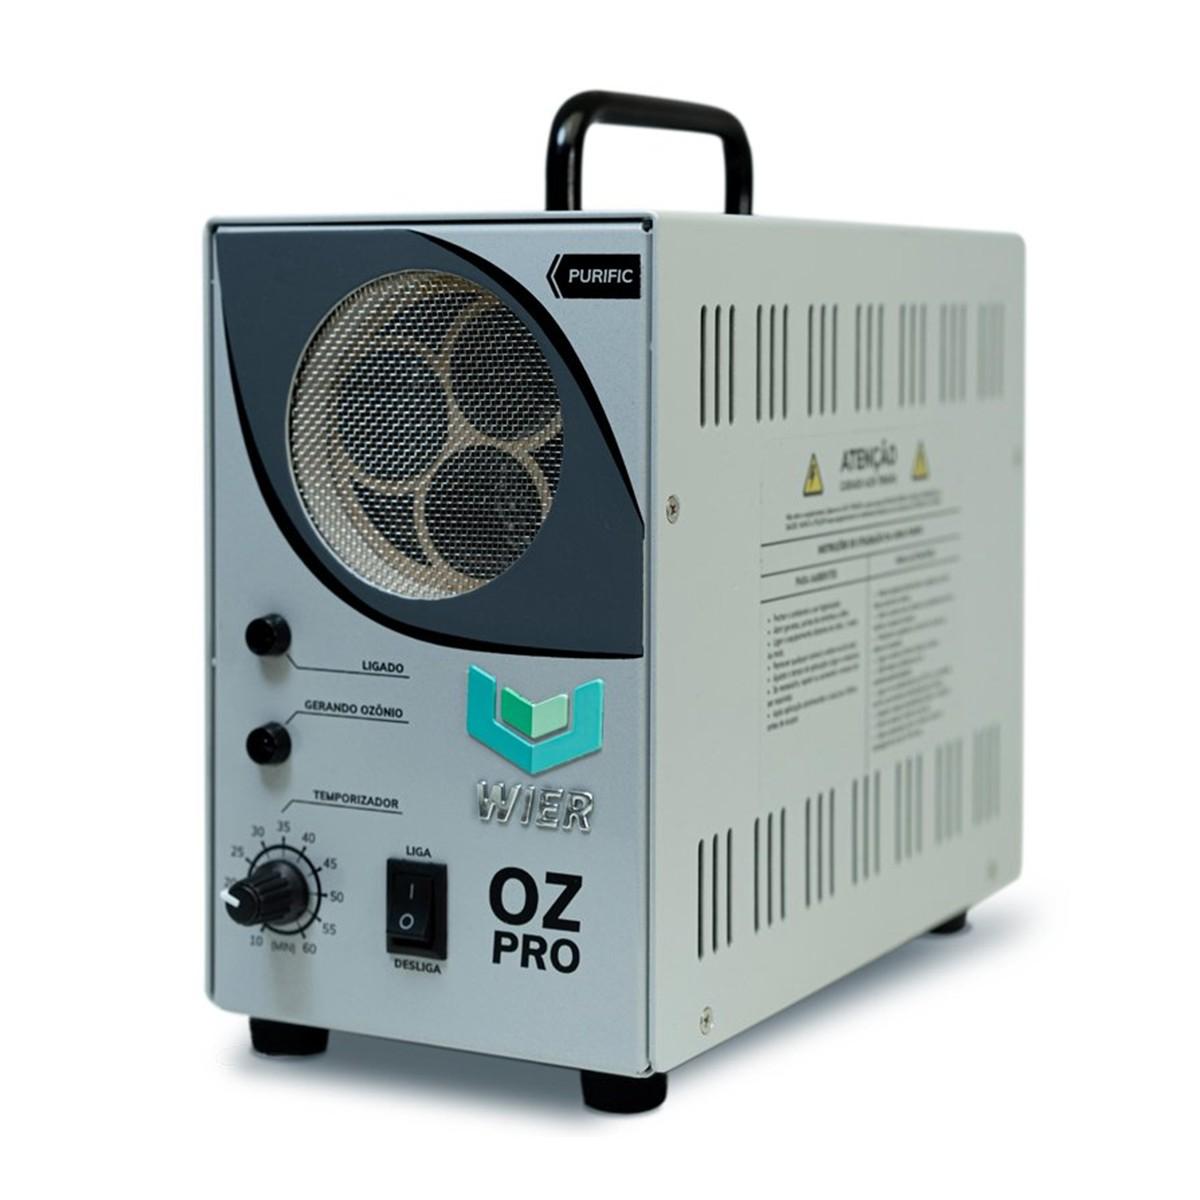 Gerador de Ozonio Purific Oz Pro 20 g/h Bivolt Wier